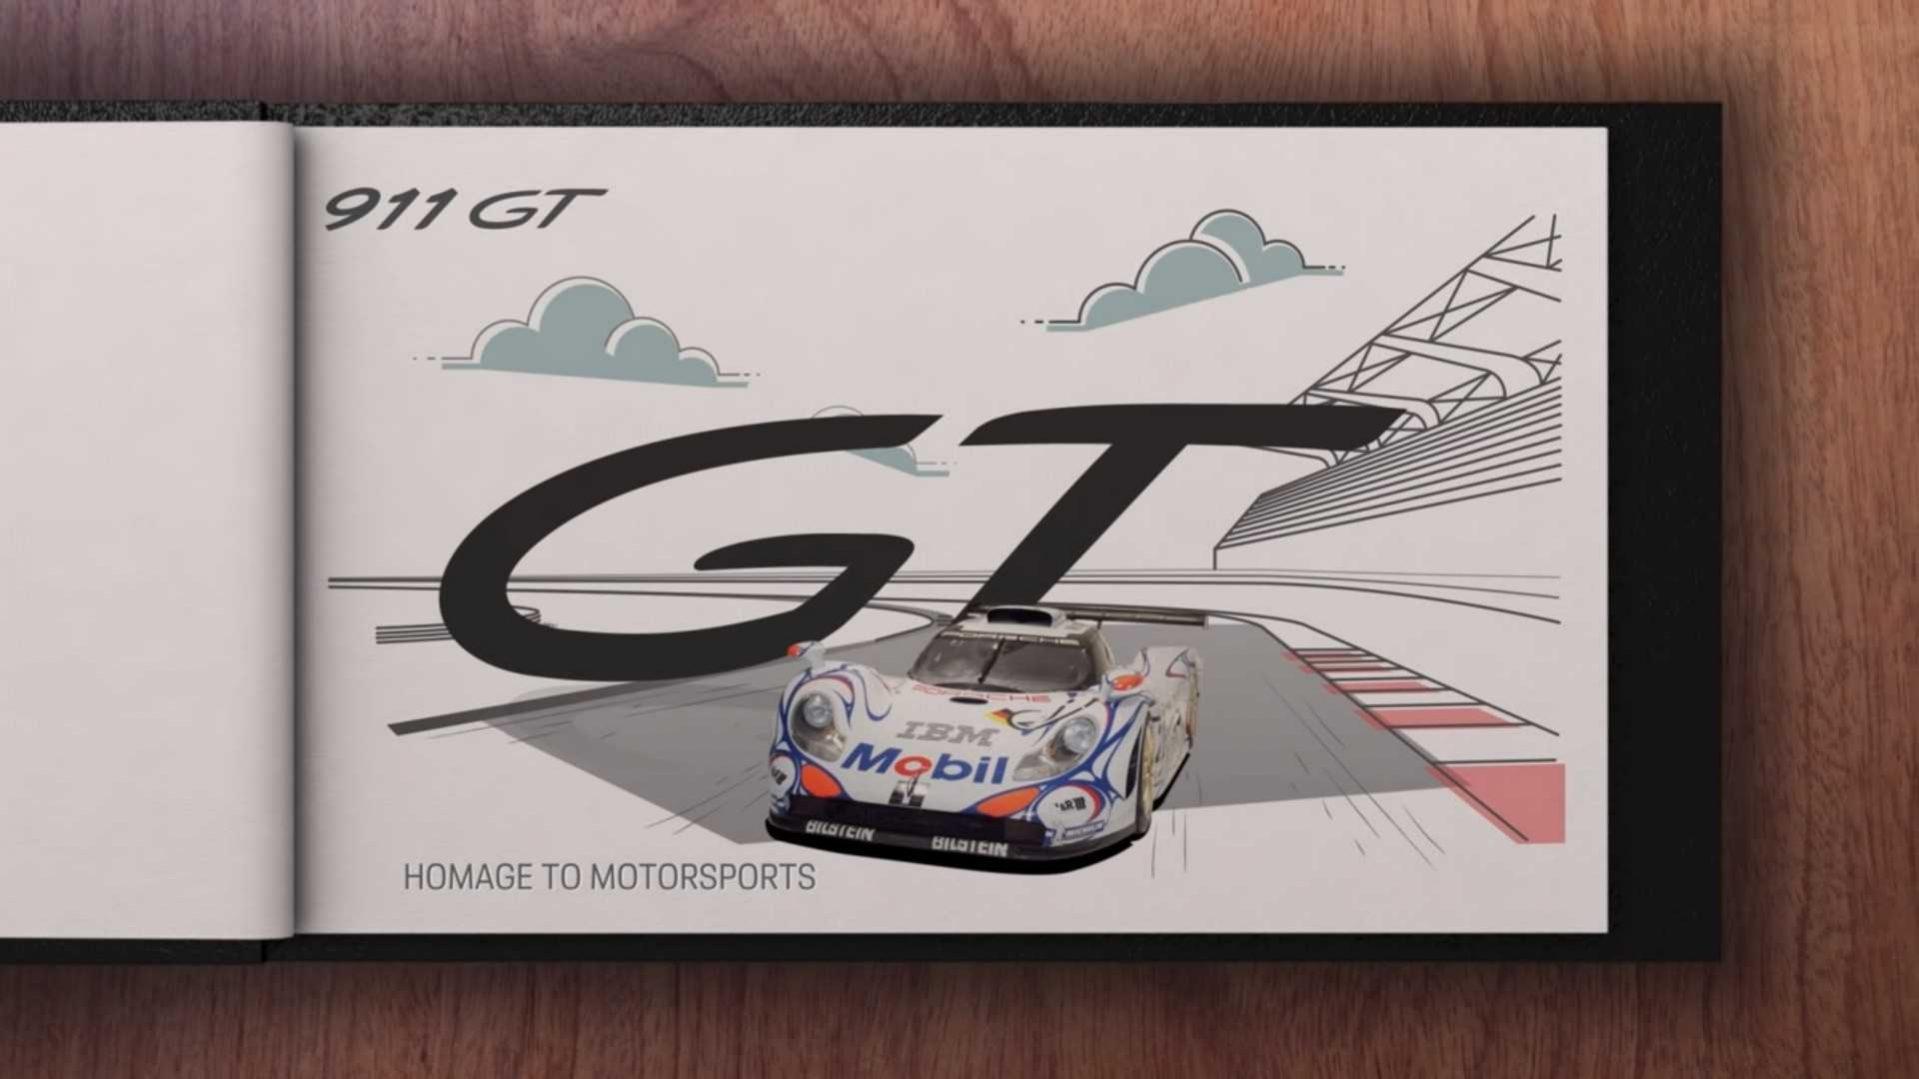 Porsche 911 GT For Sale